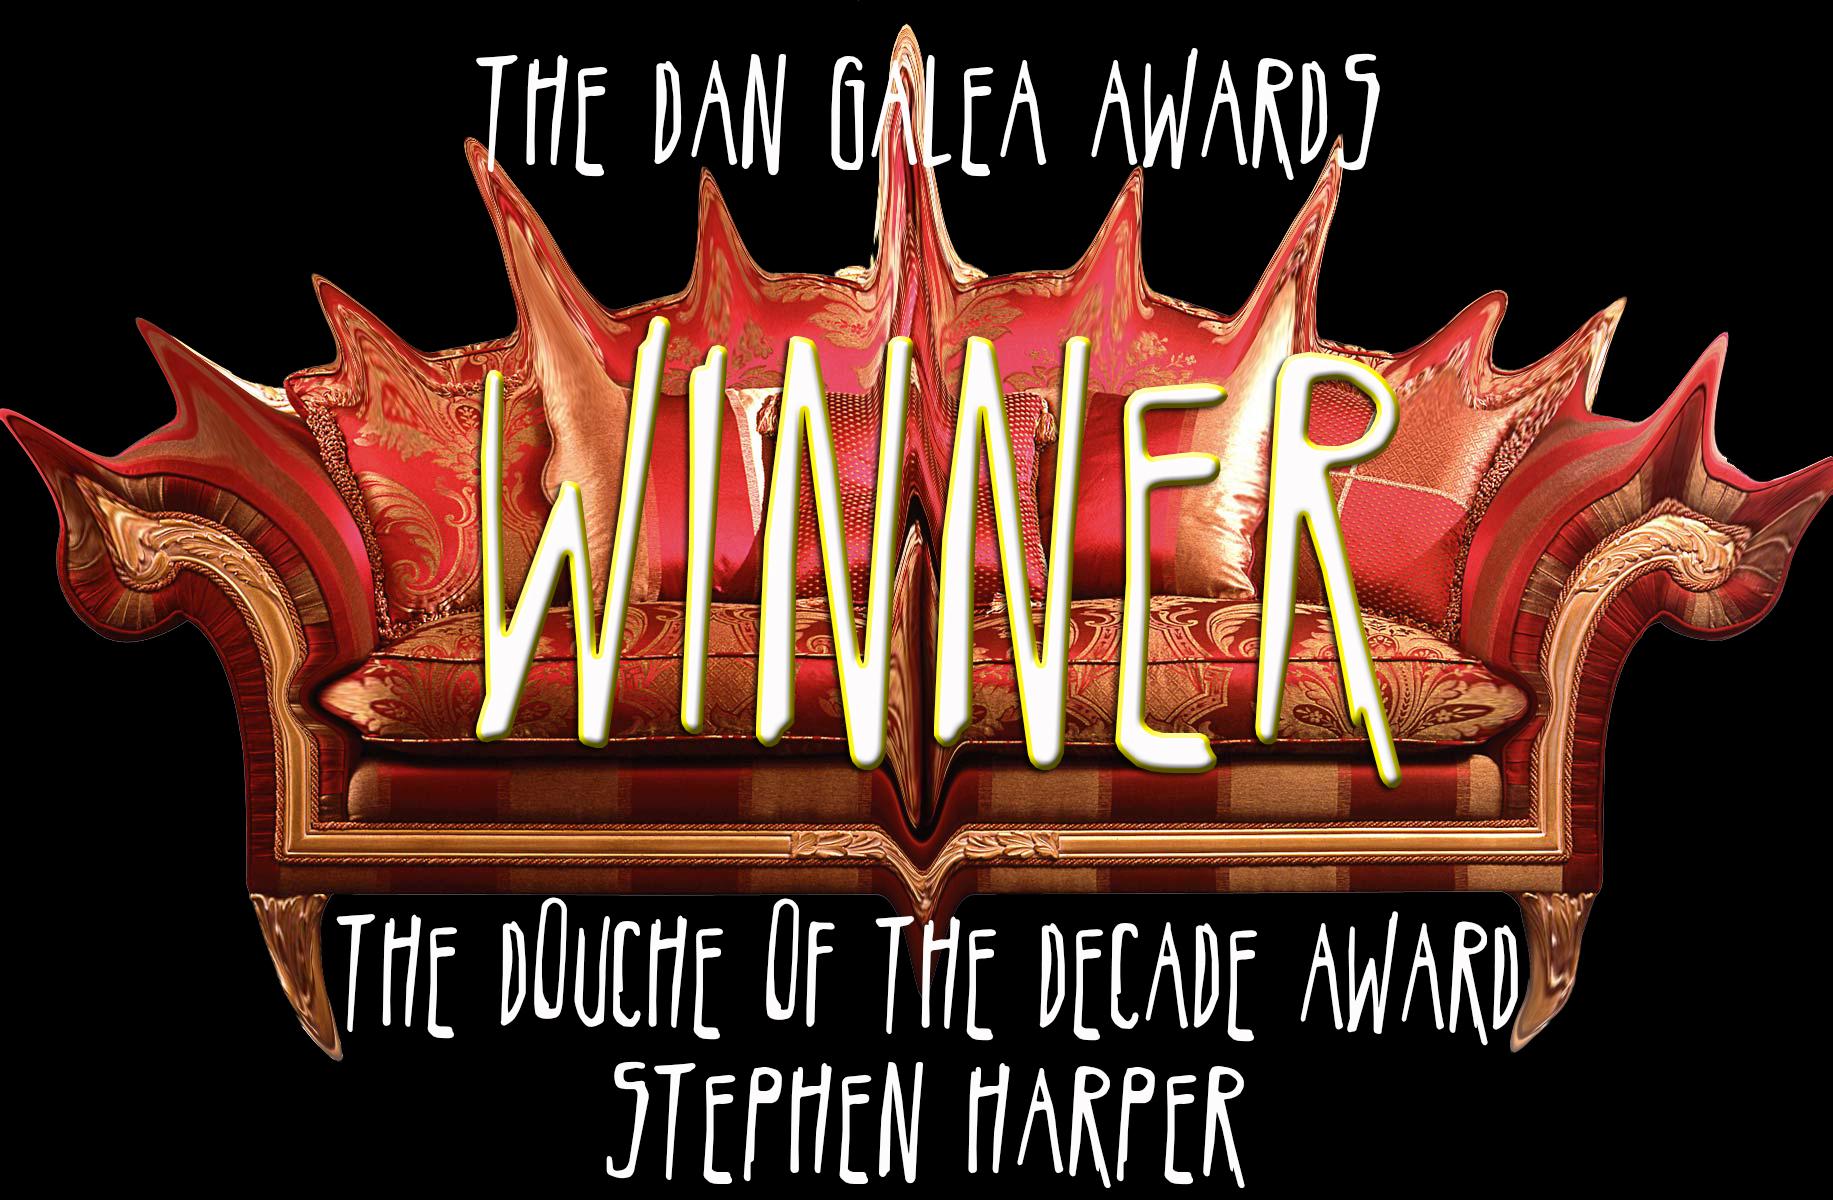 DGawards stephen harper.jpg